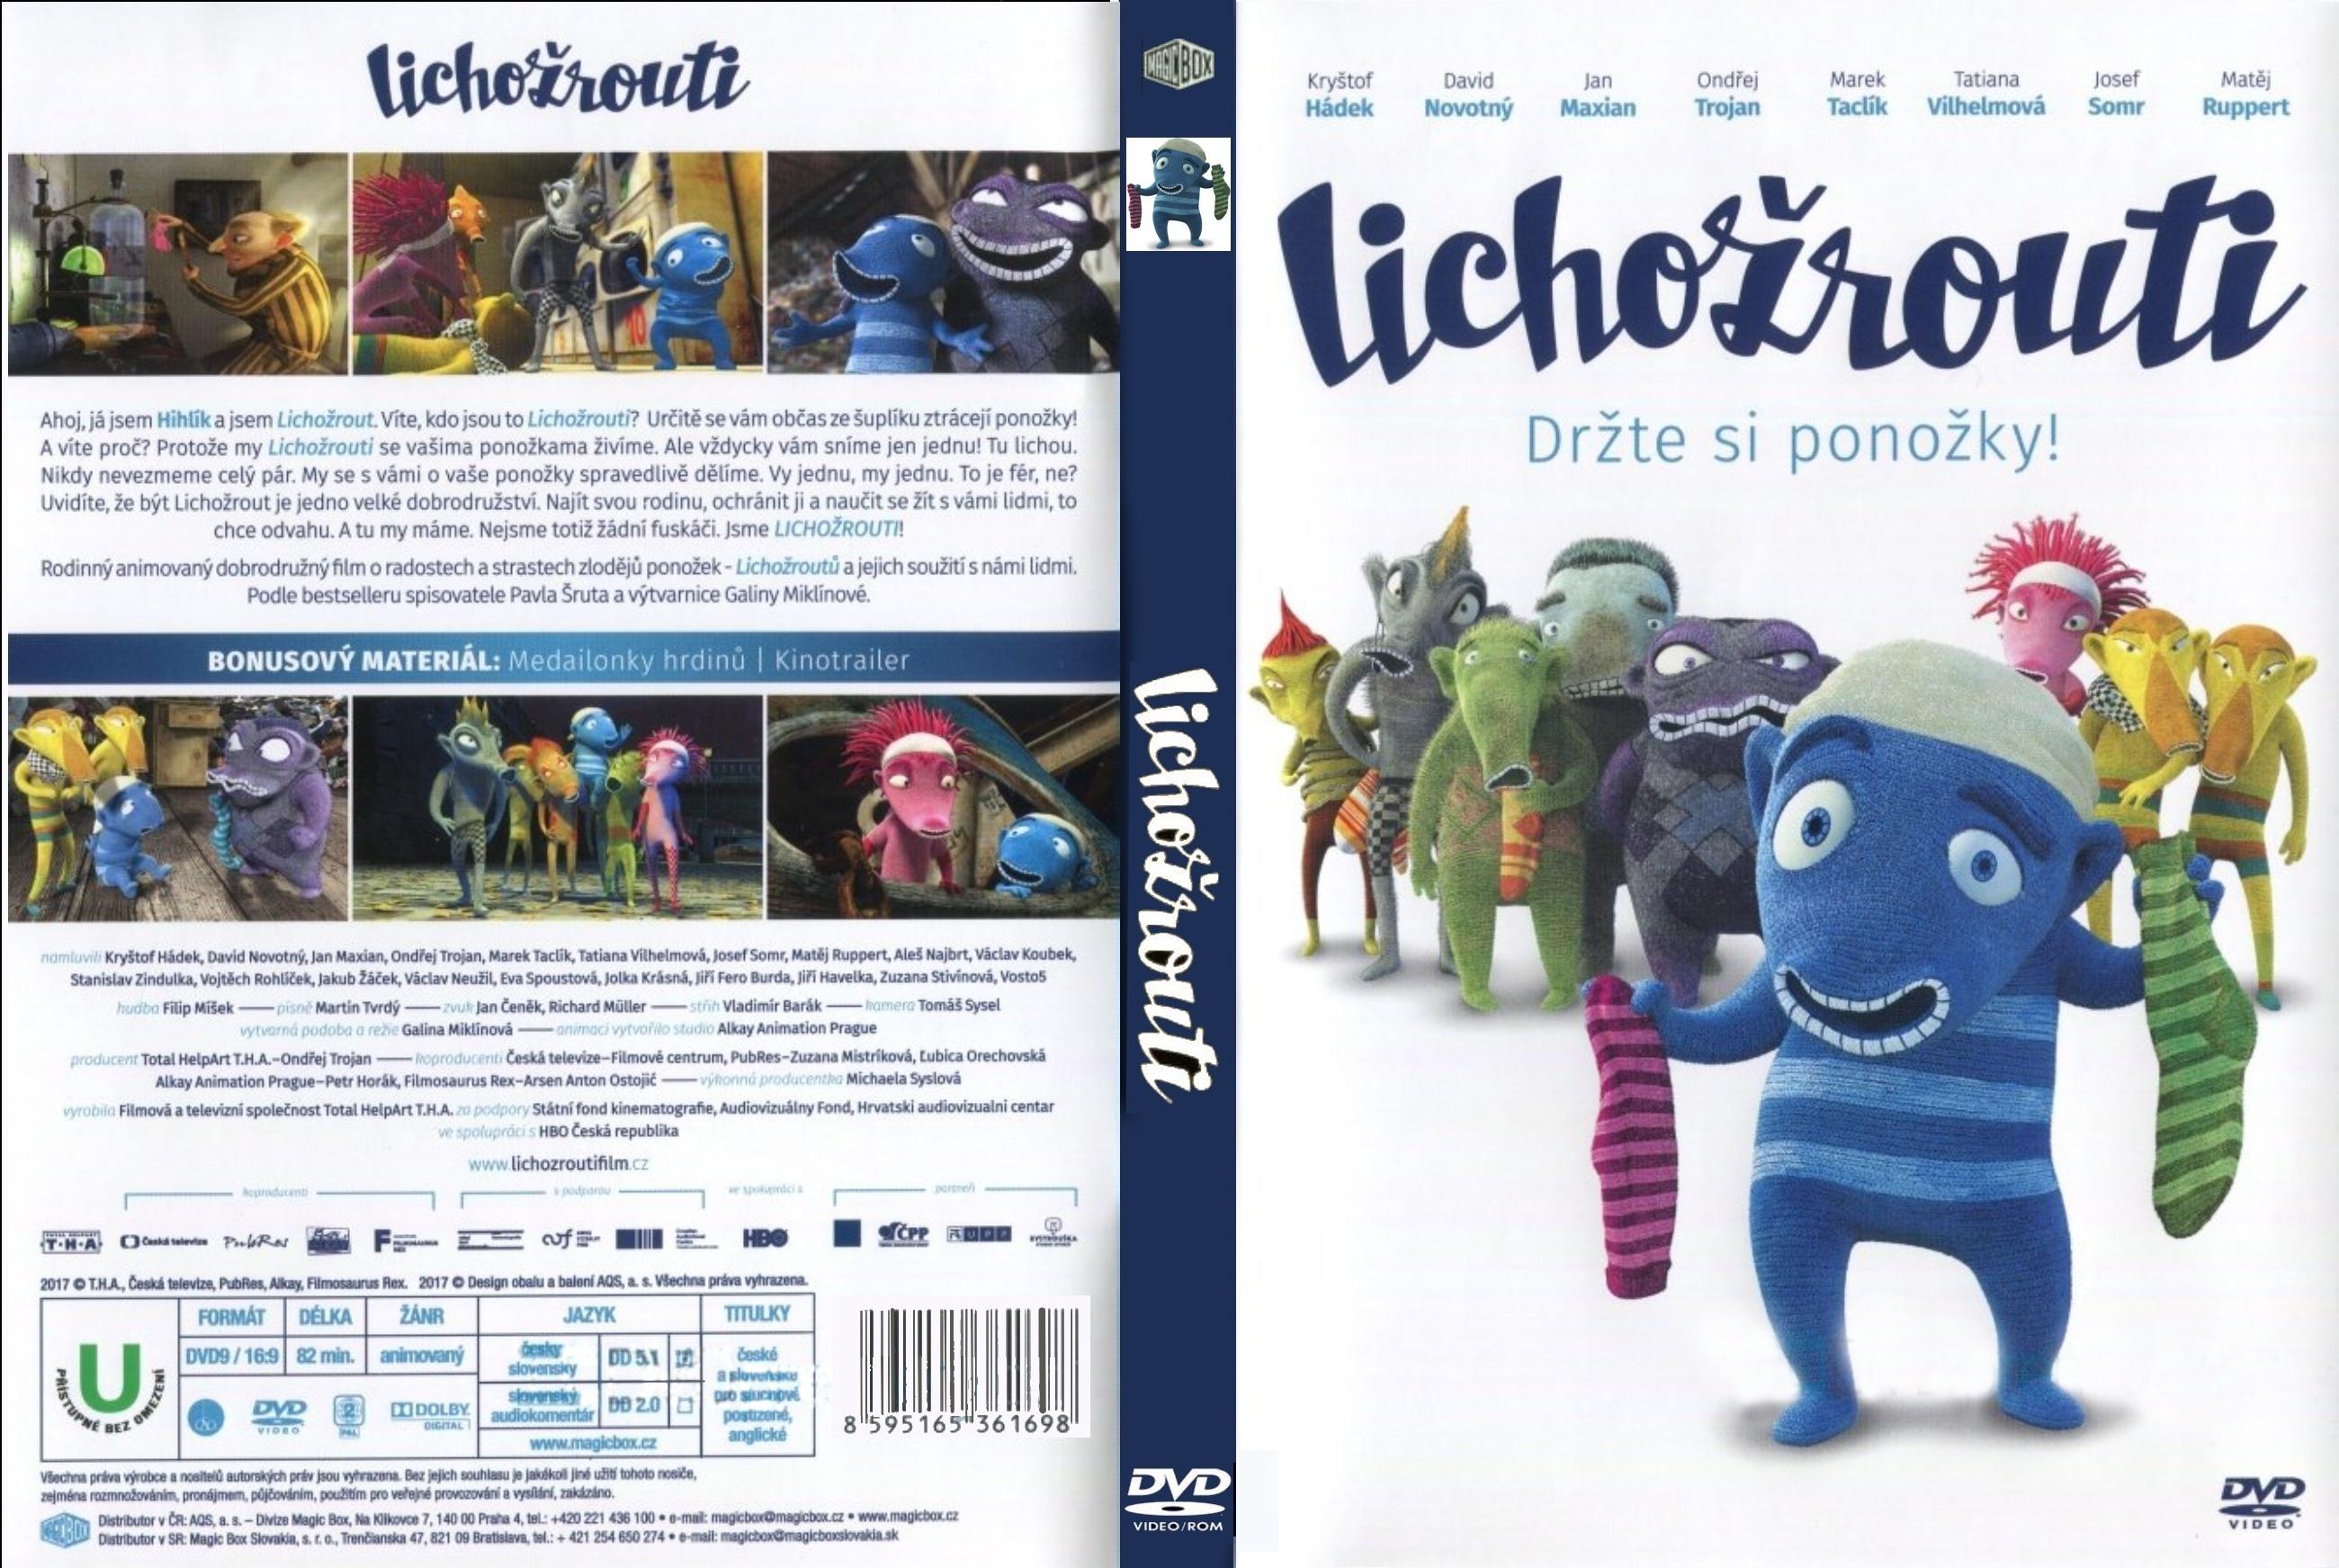 7c432c2ef7a COVERS.BOX.SK     Lichožrouti (2016) - high quality DVD   Blueray ...